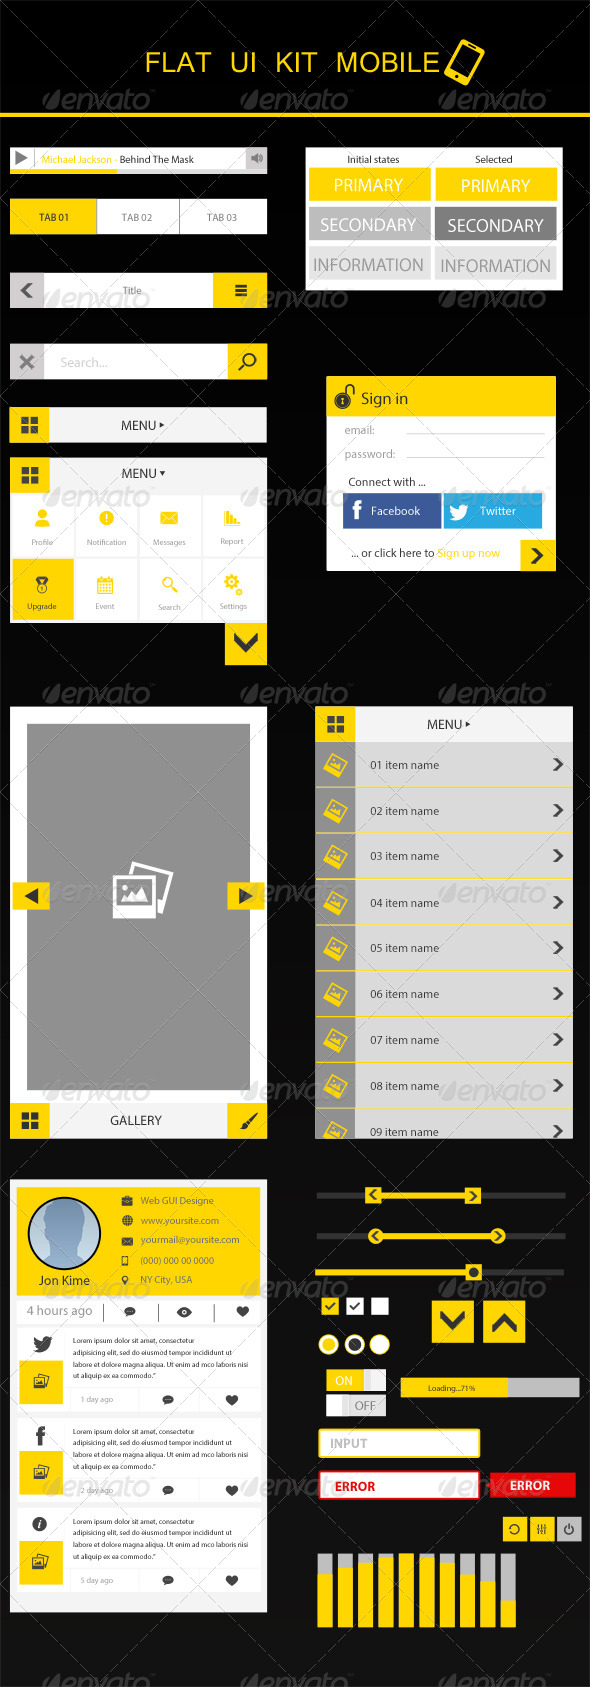 Flat UI Mobile